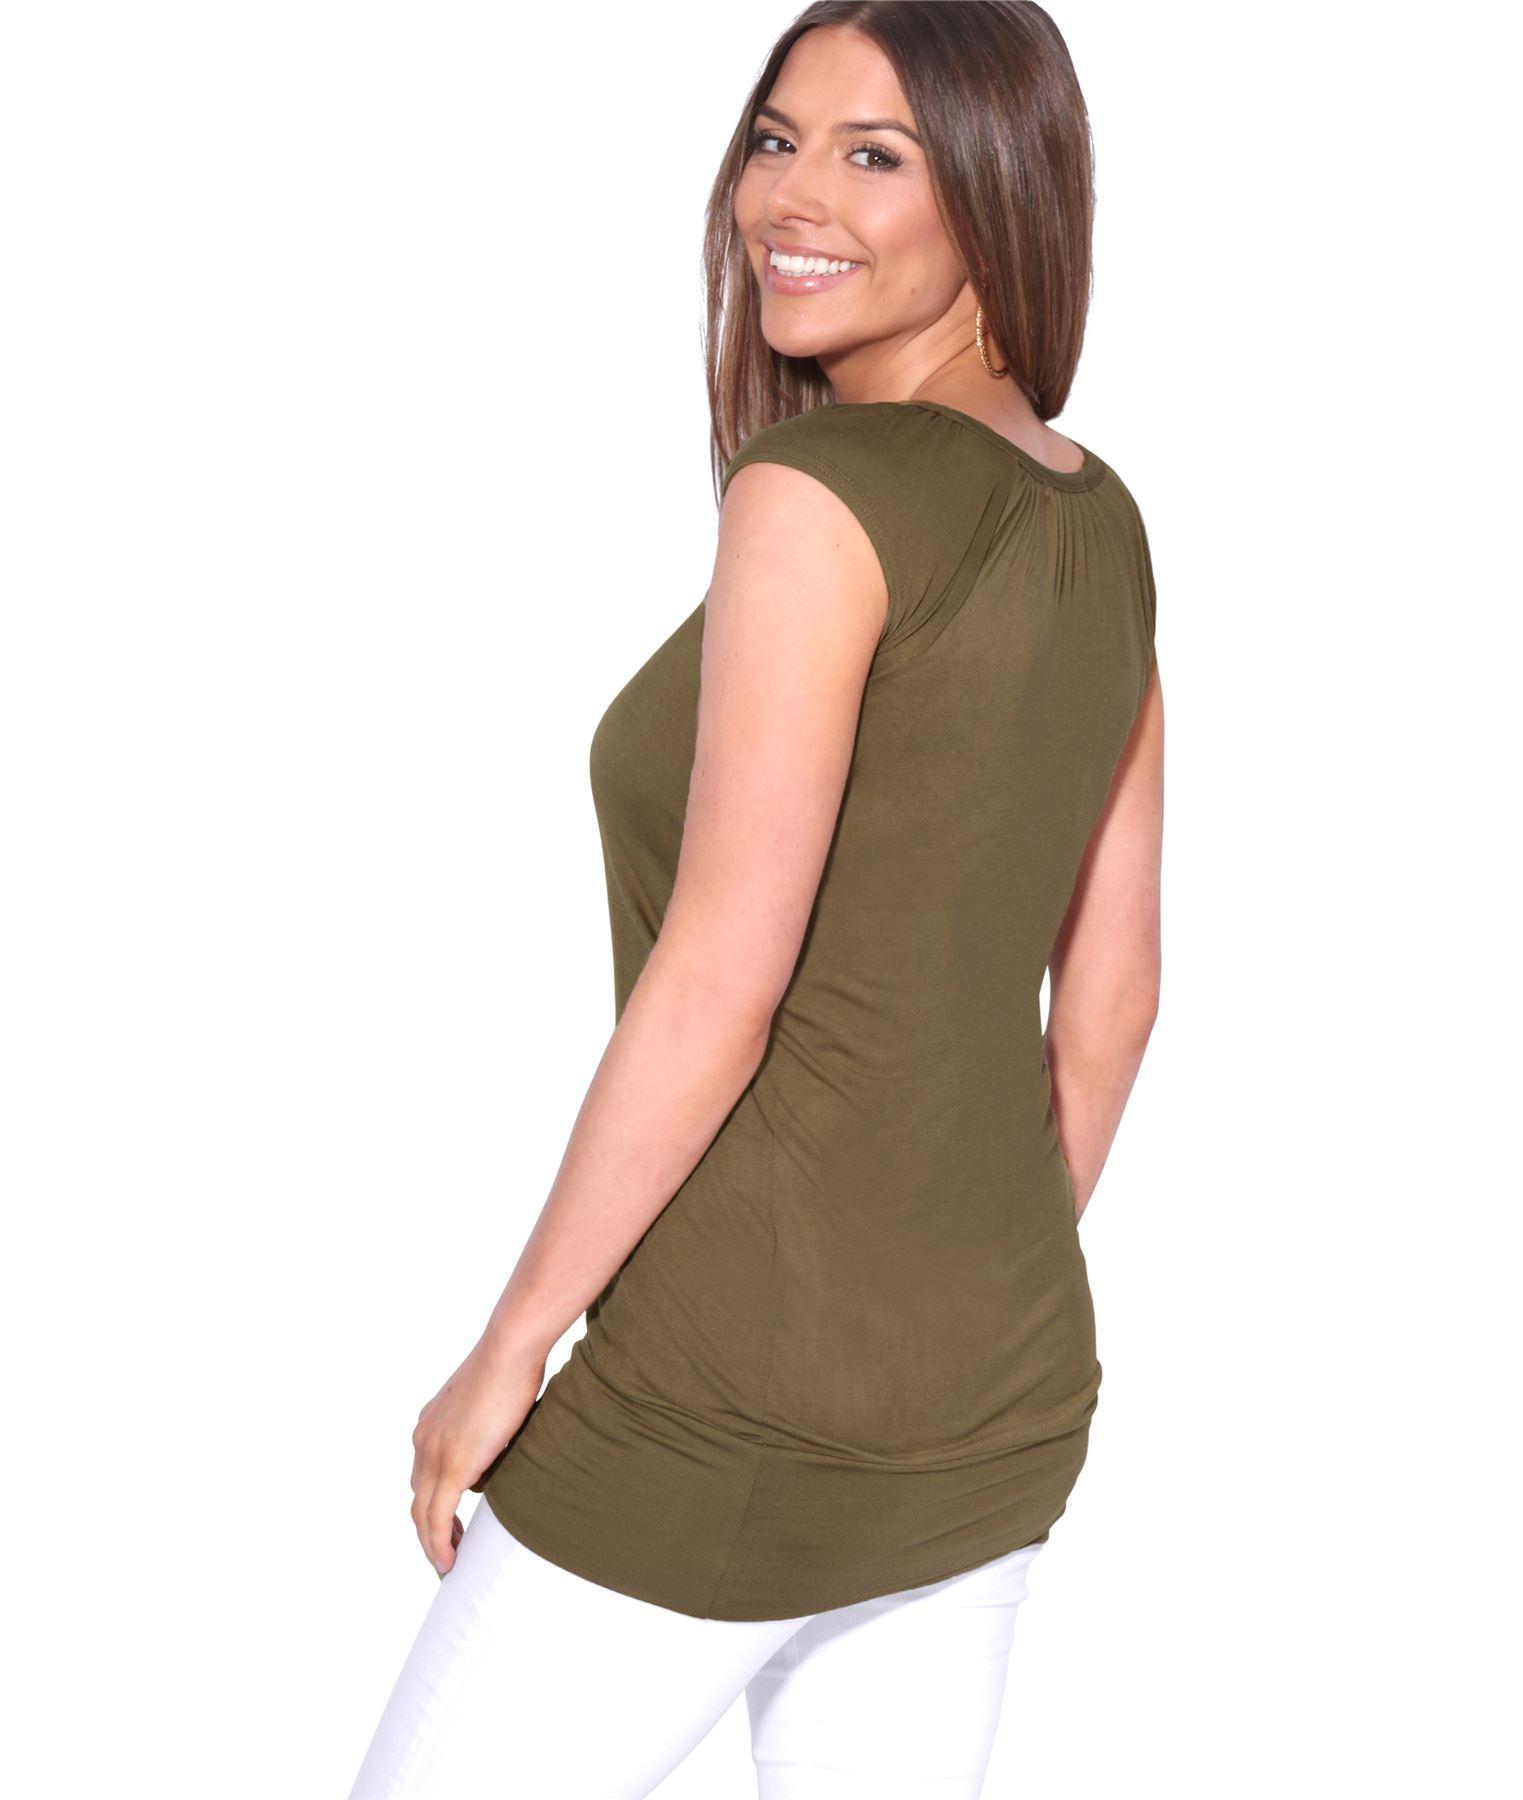 Womens-Ladies-Scoop-Neck-Blouse-V-T-Shirt-Long-Short-Sleeve-Plain-Loose-Top thumbnail 24